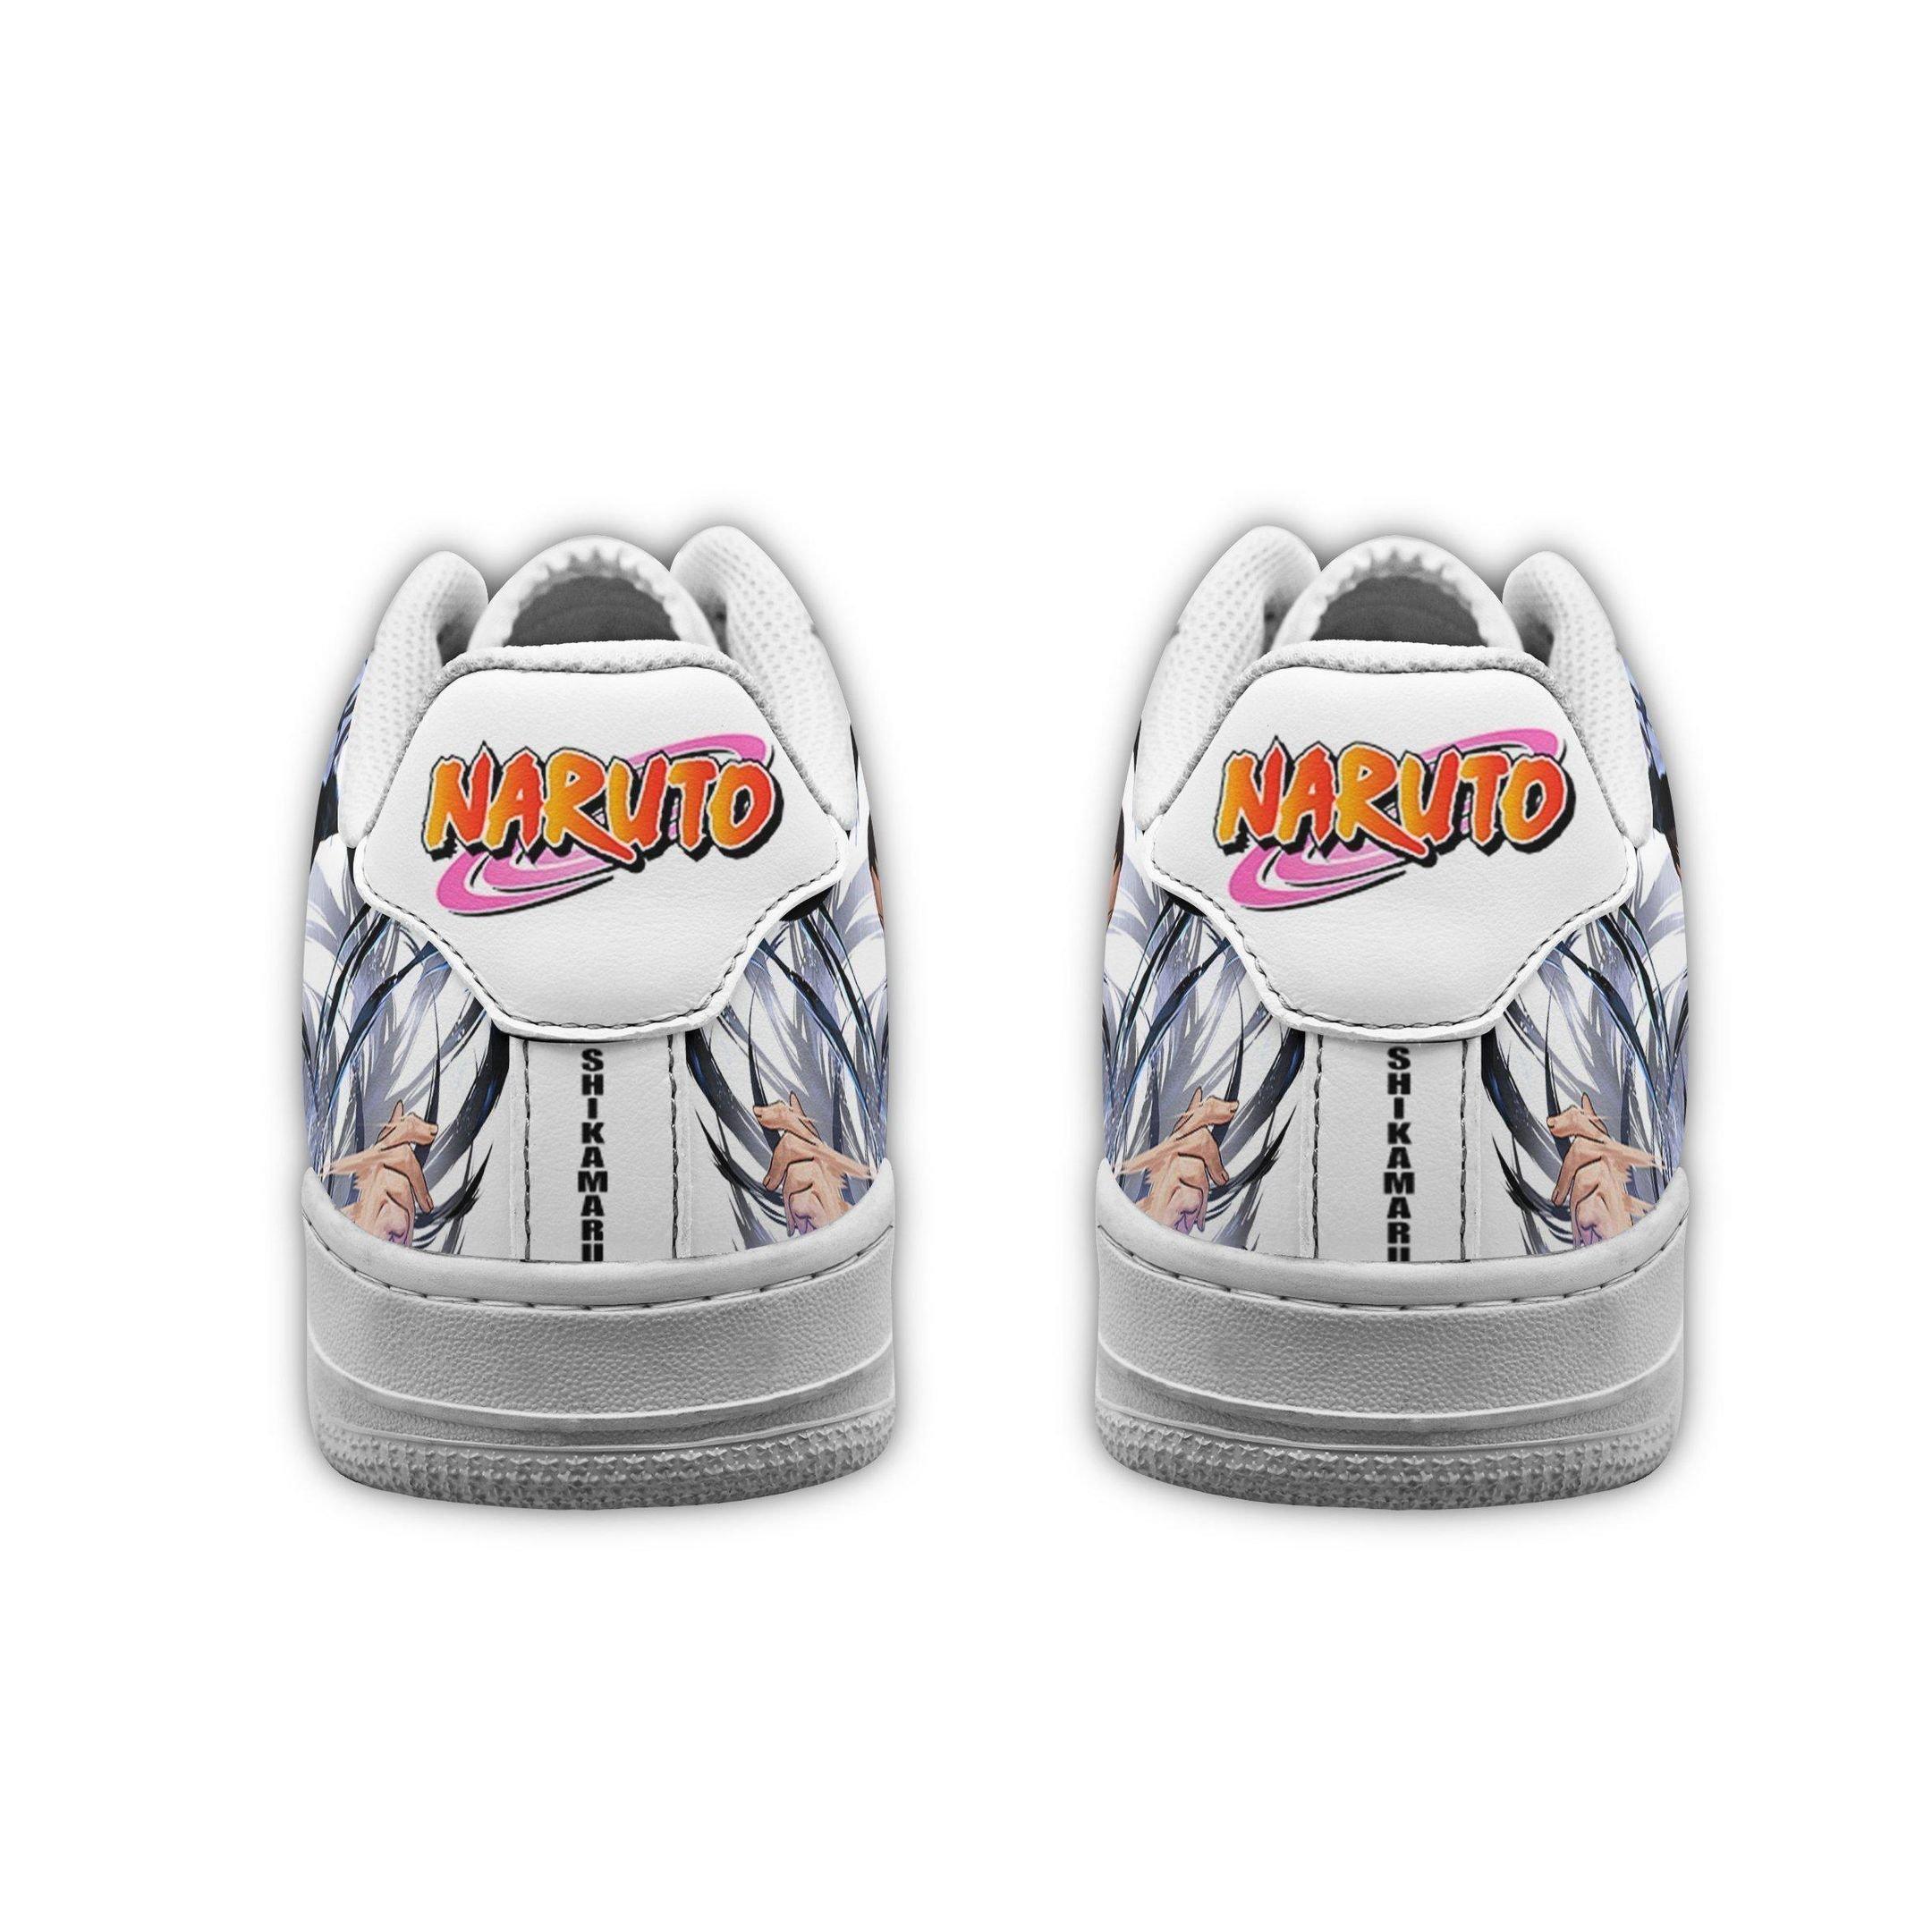 Shikamaru Air Shoes Naruto Anime Shoes Fan Gift GO1012